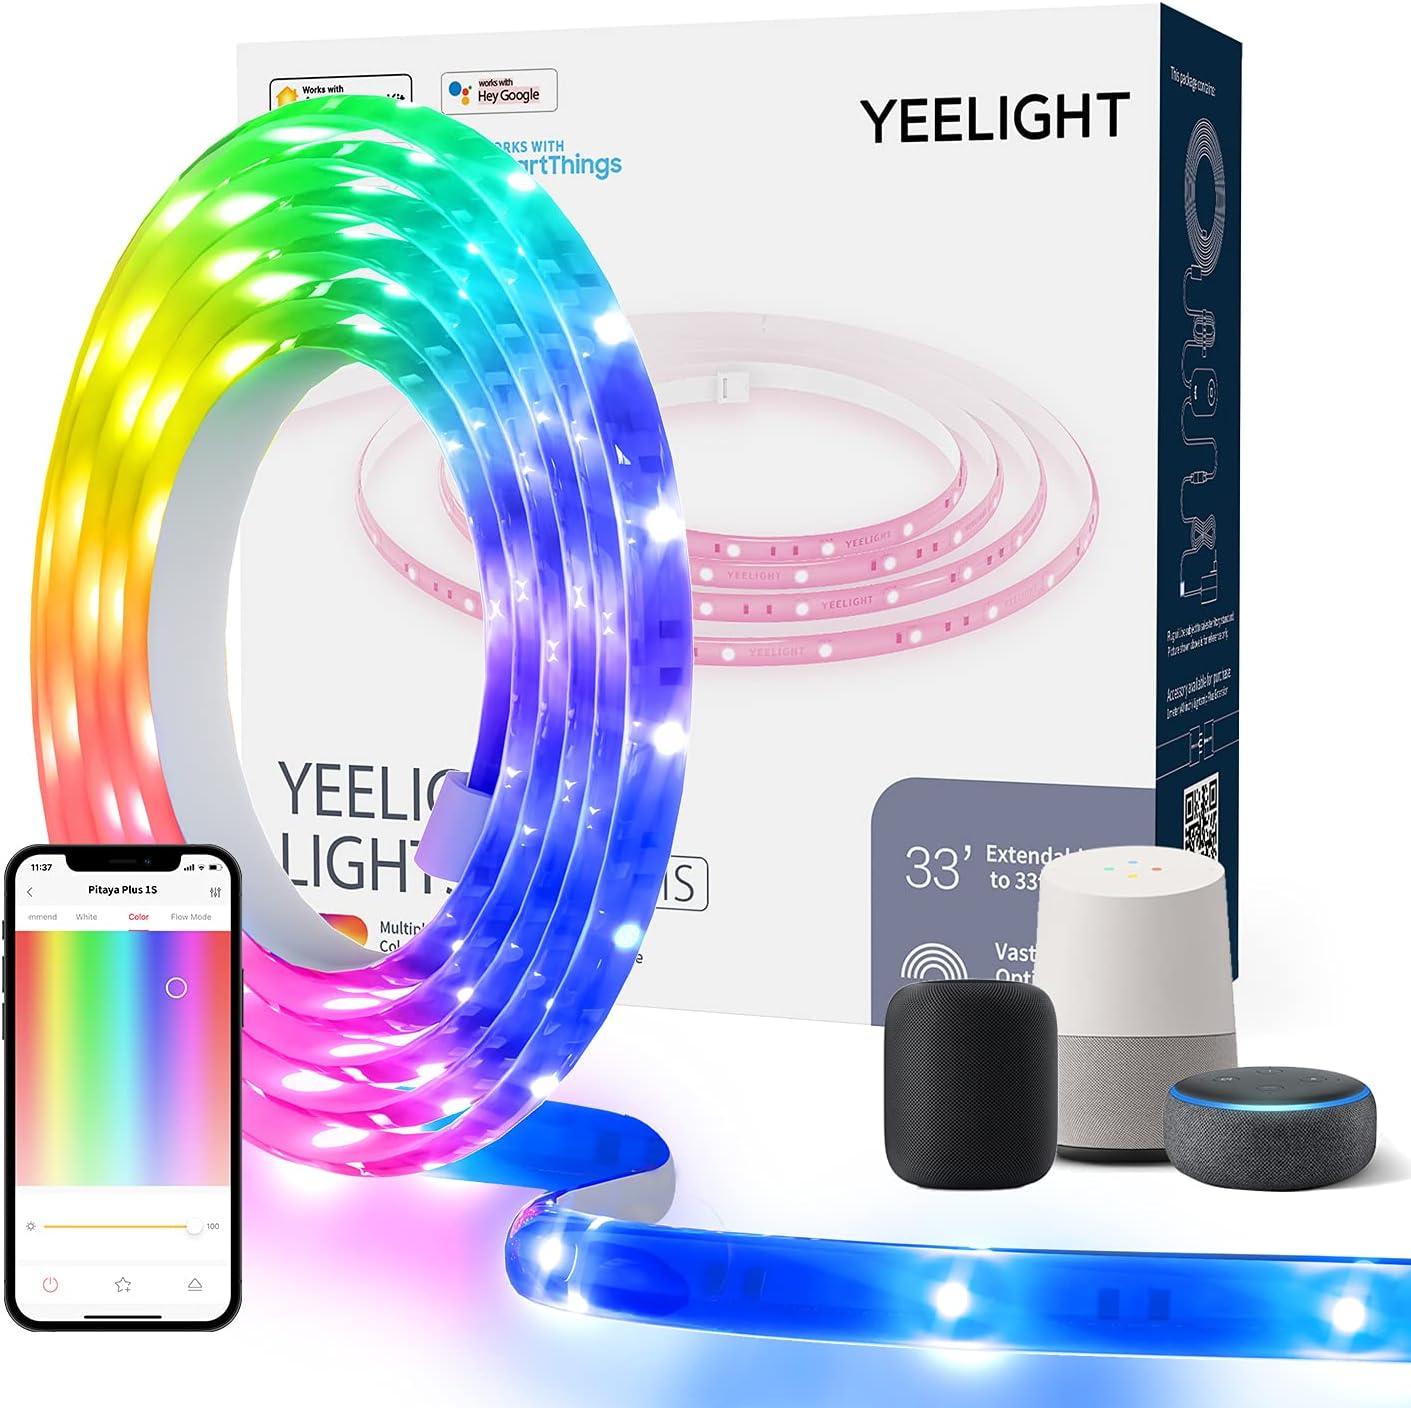 Yeelight 6.5ft Smart RGB WIFI LED Light Strip $15.99 Coupon